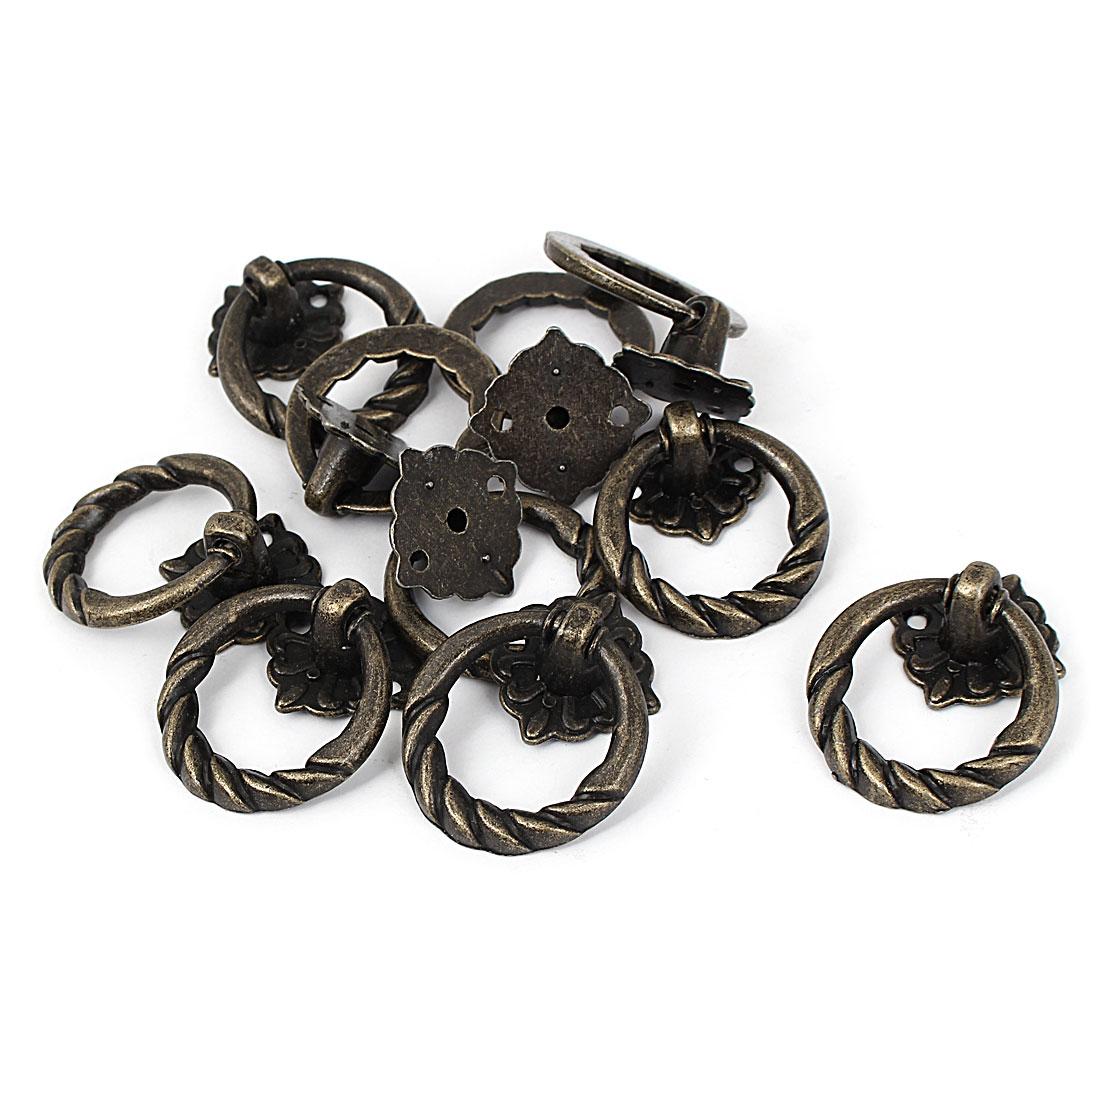 Furniture Showcase Door Box Metal Pendant Pull Handle Ring Knob 37mm Dia 10pcs